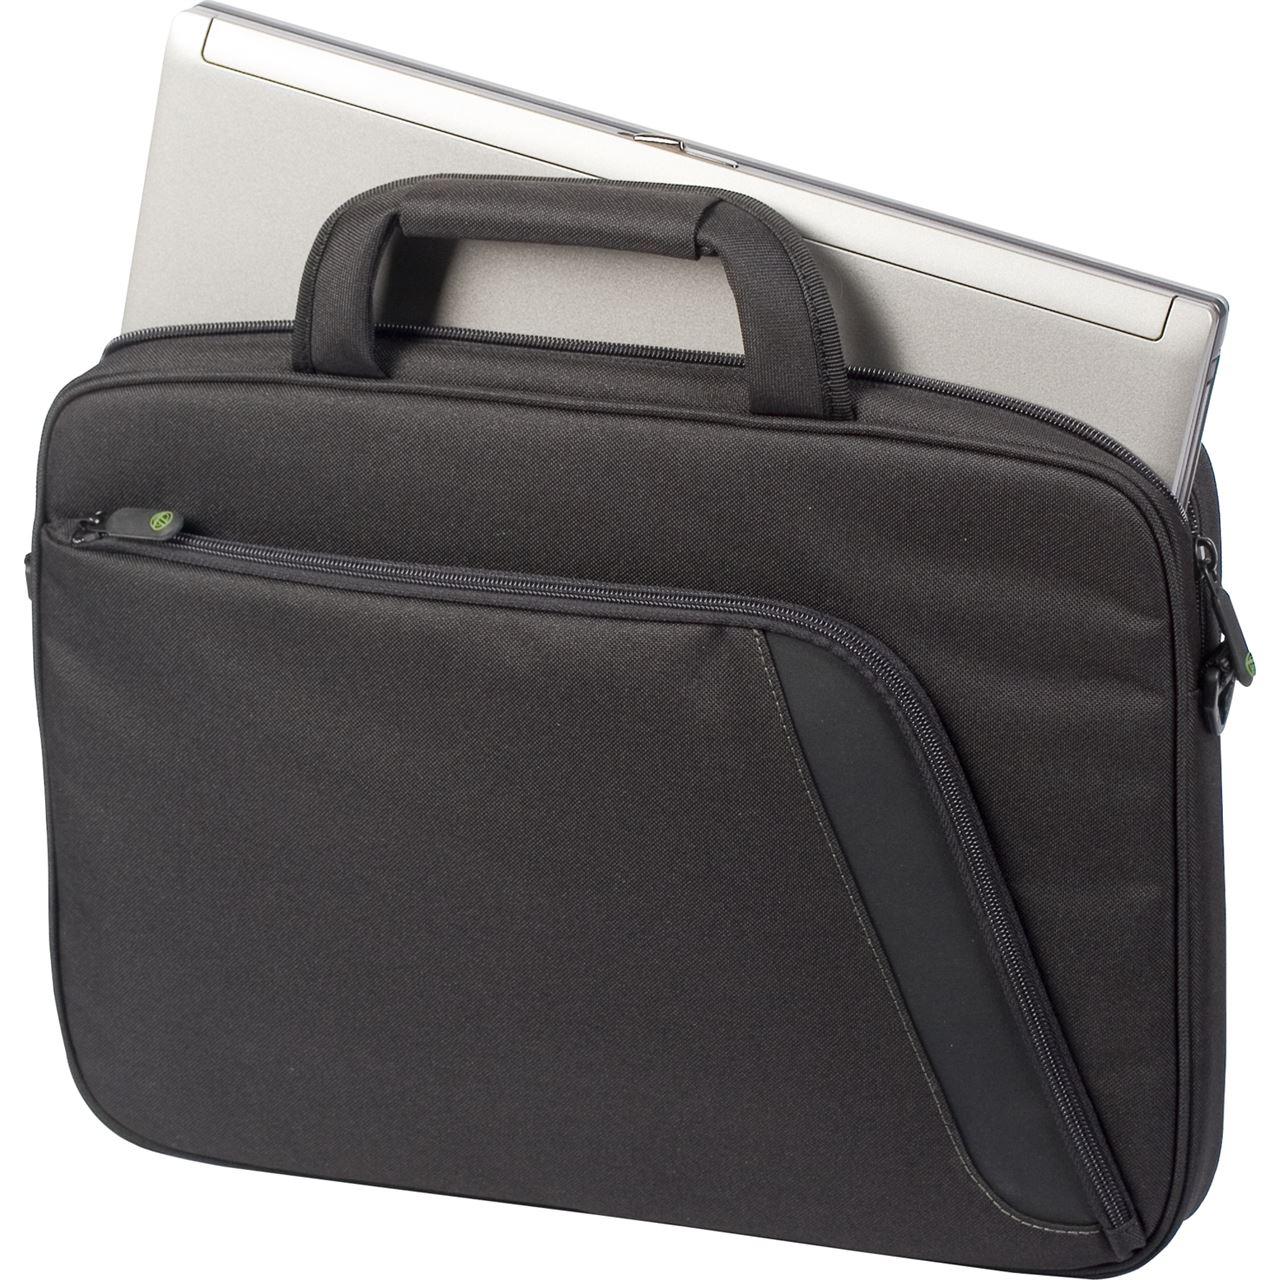 16 spruce laptop sleeve with shoulder strap tbs045us gray sleeves targus. Black Bedroom Furniture Sets. Home Design Ideas